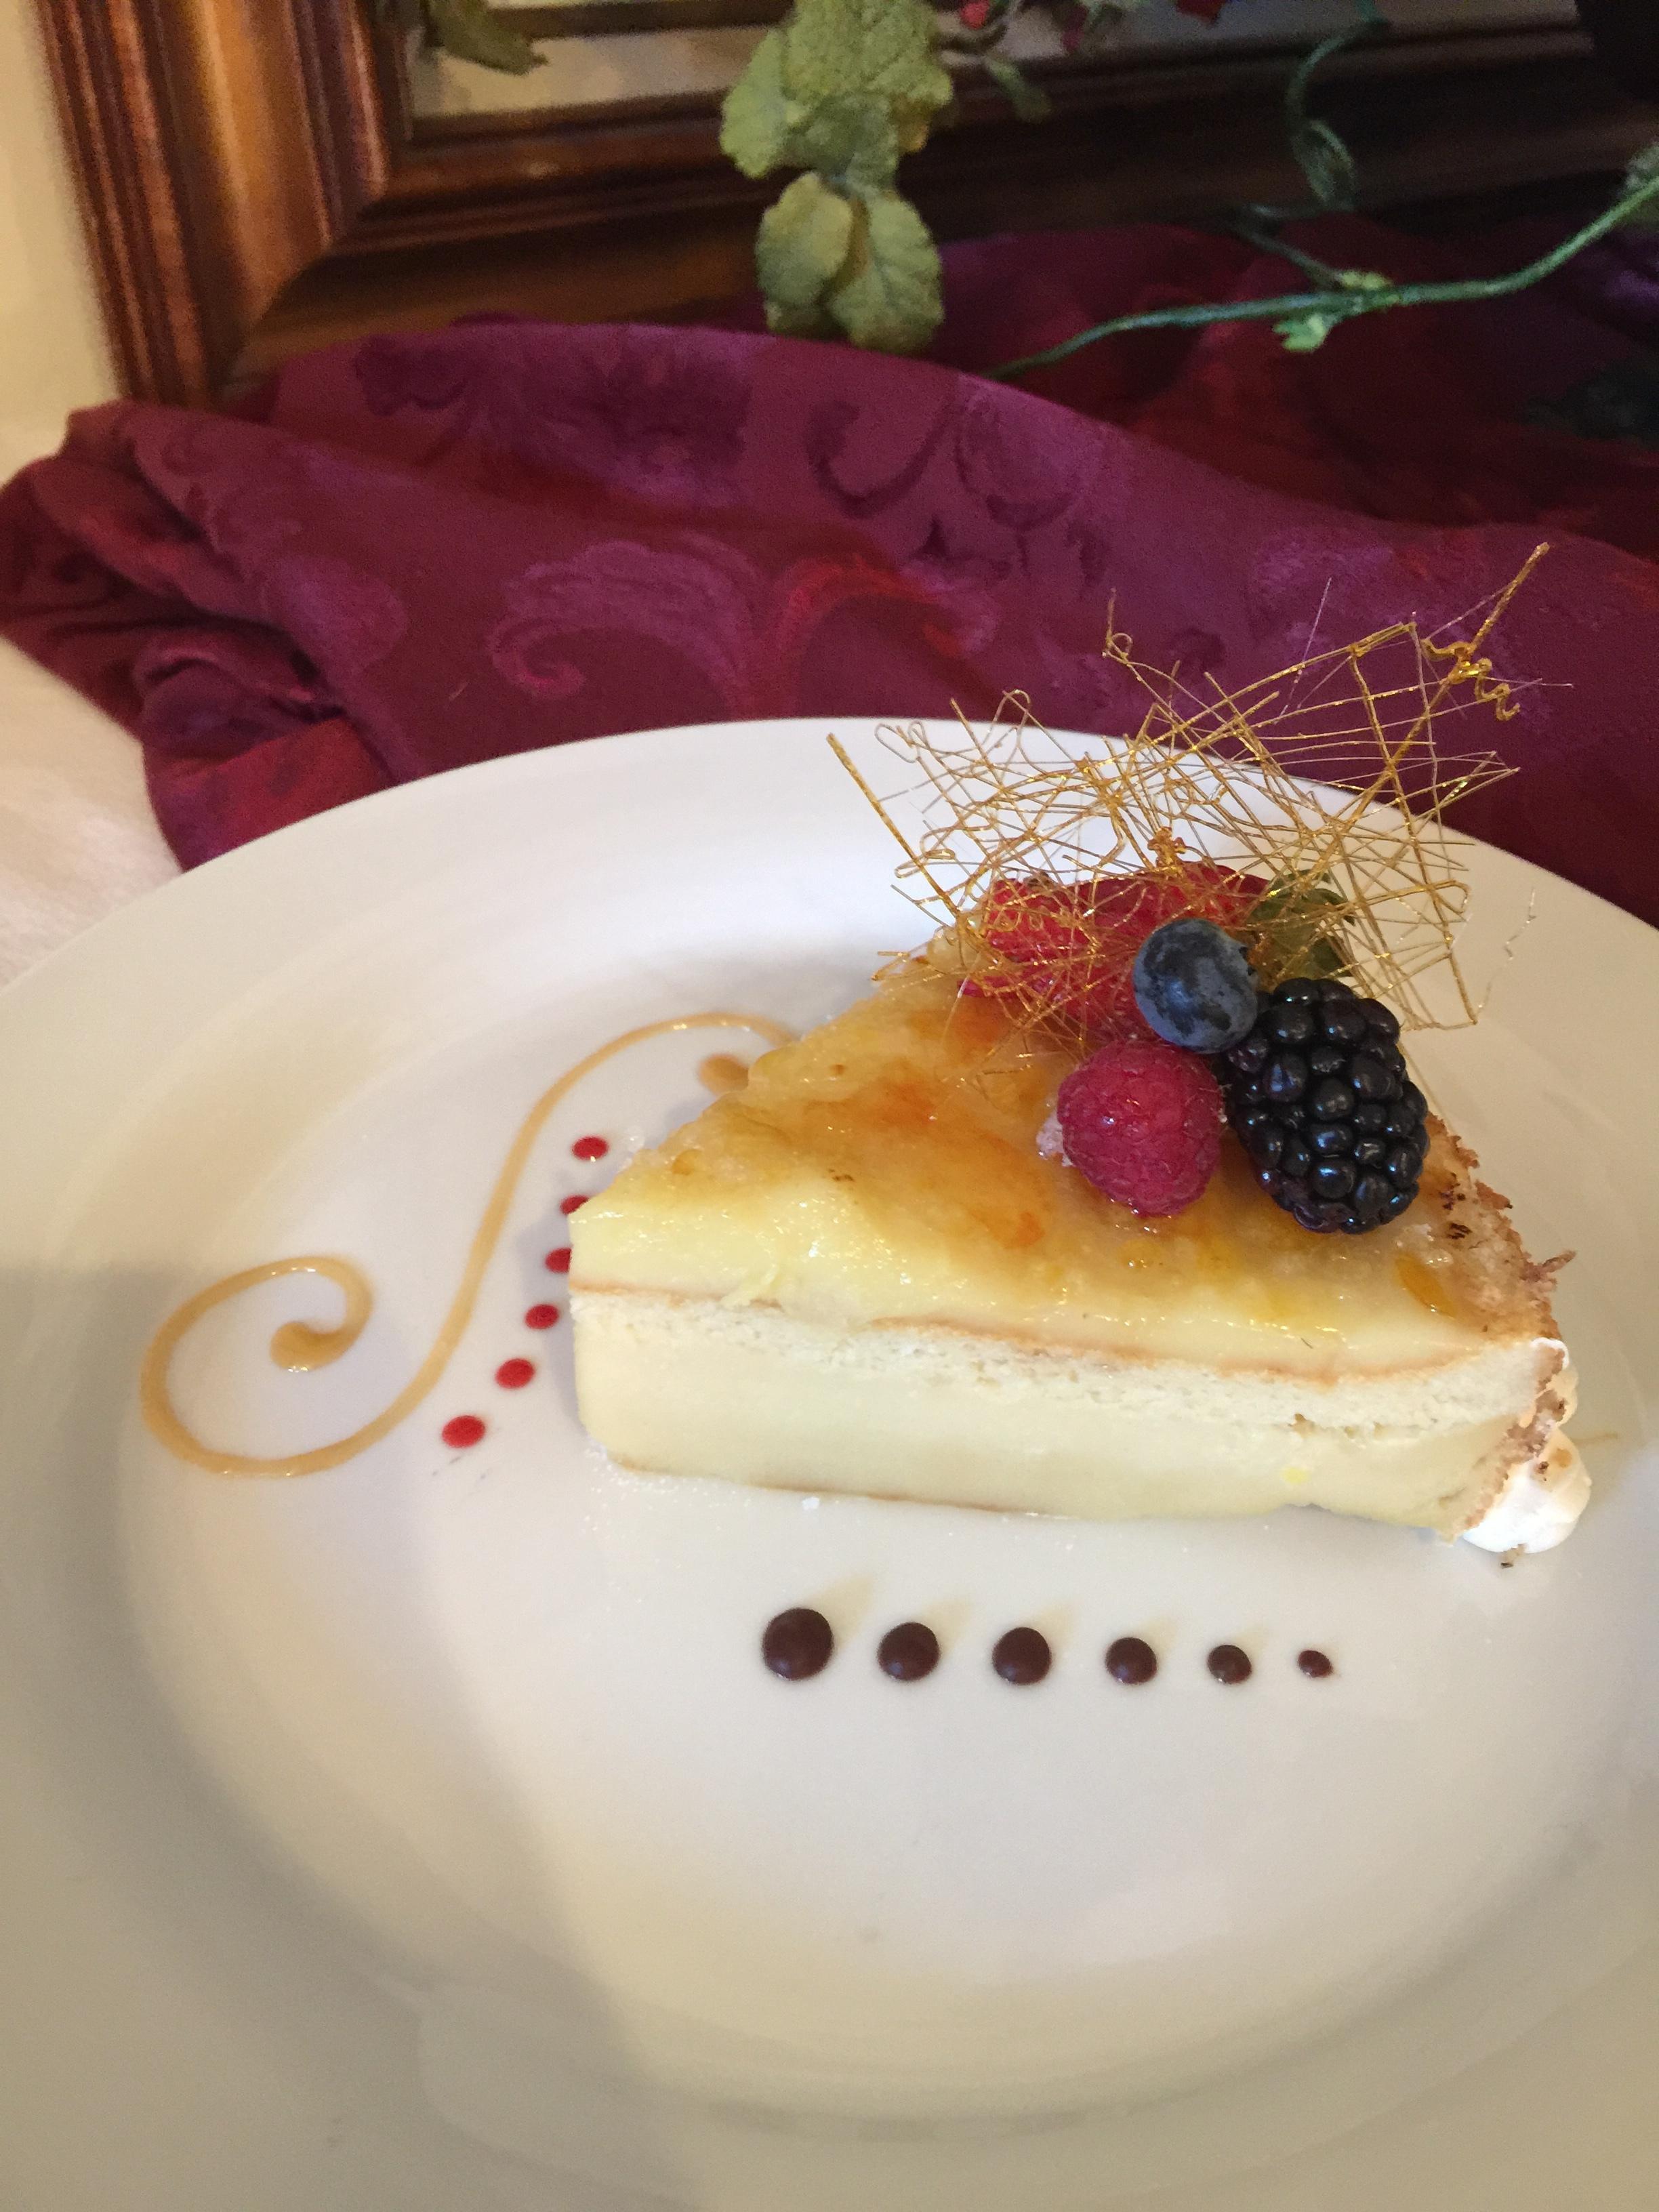 Geoffrey Larsen Sassy's Cafe & Bakery 480-649-3067